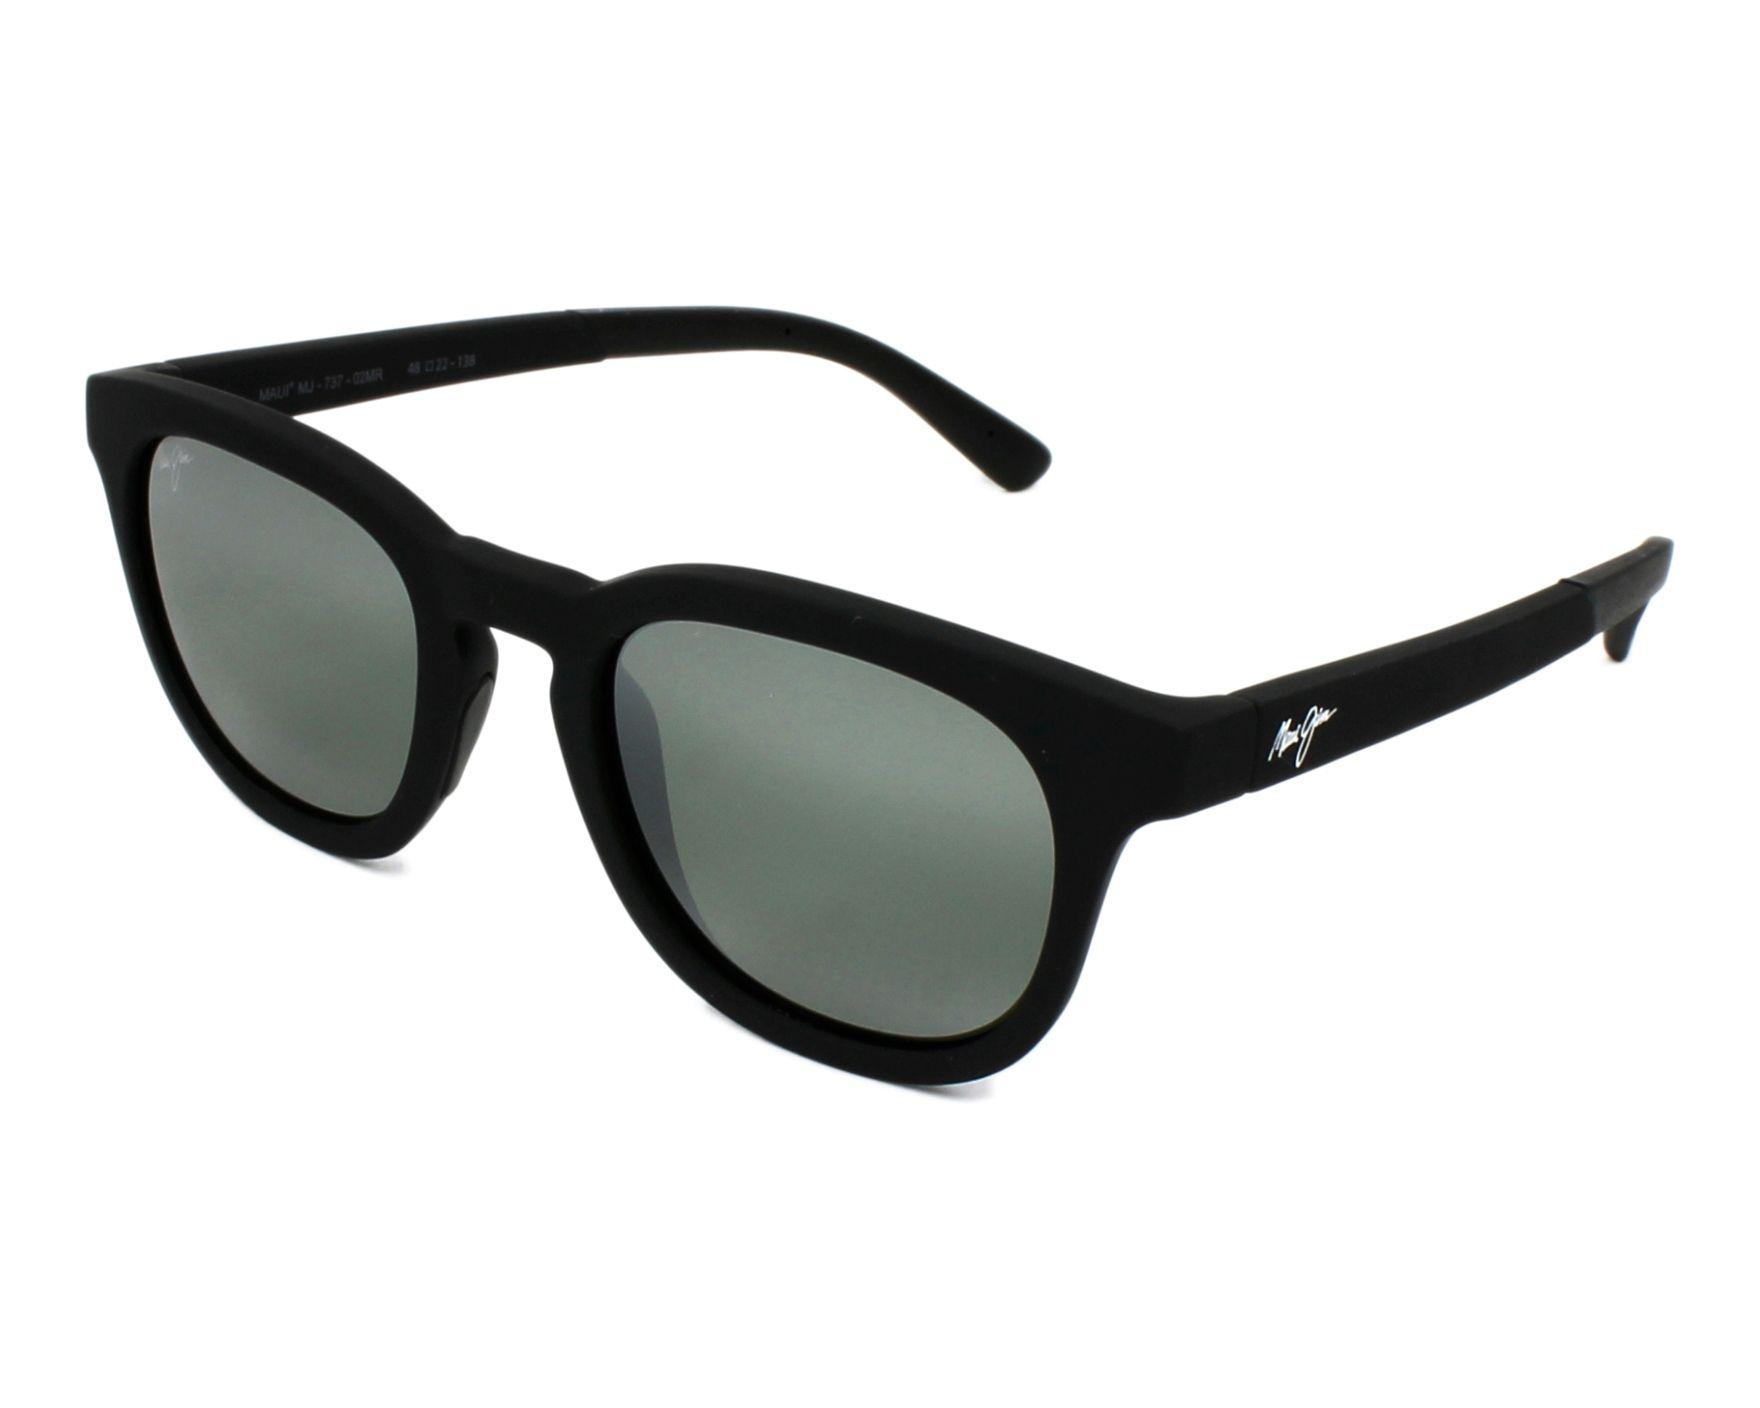 Maui Jim Sunglasses San Go  maui jim sunglasses koko head mj737 02mr 48 visionet